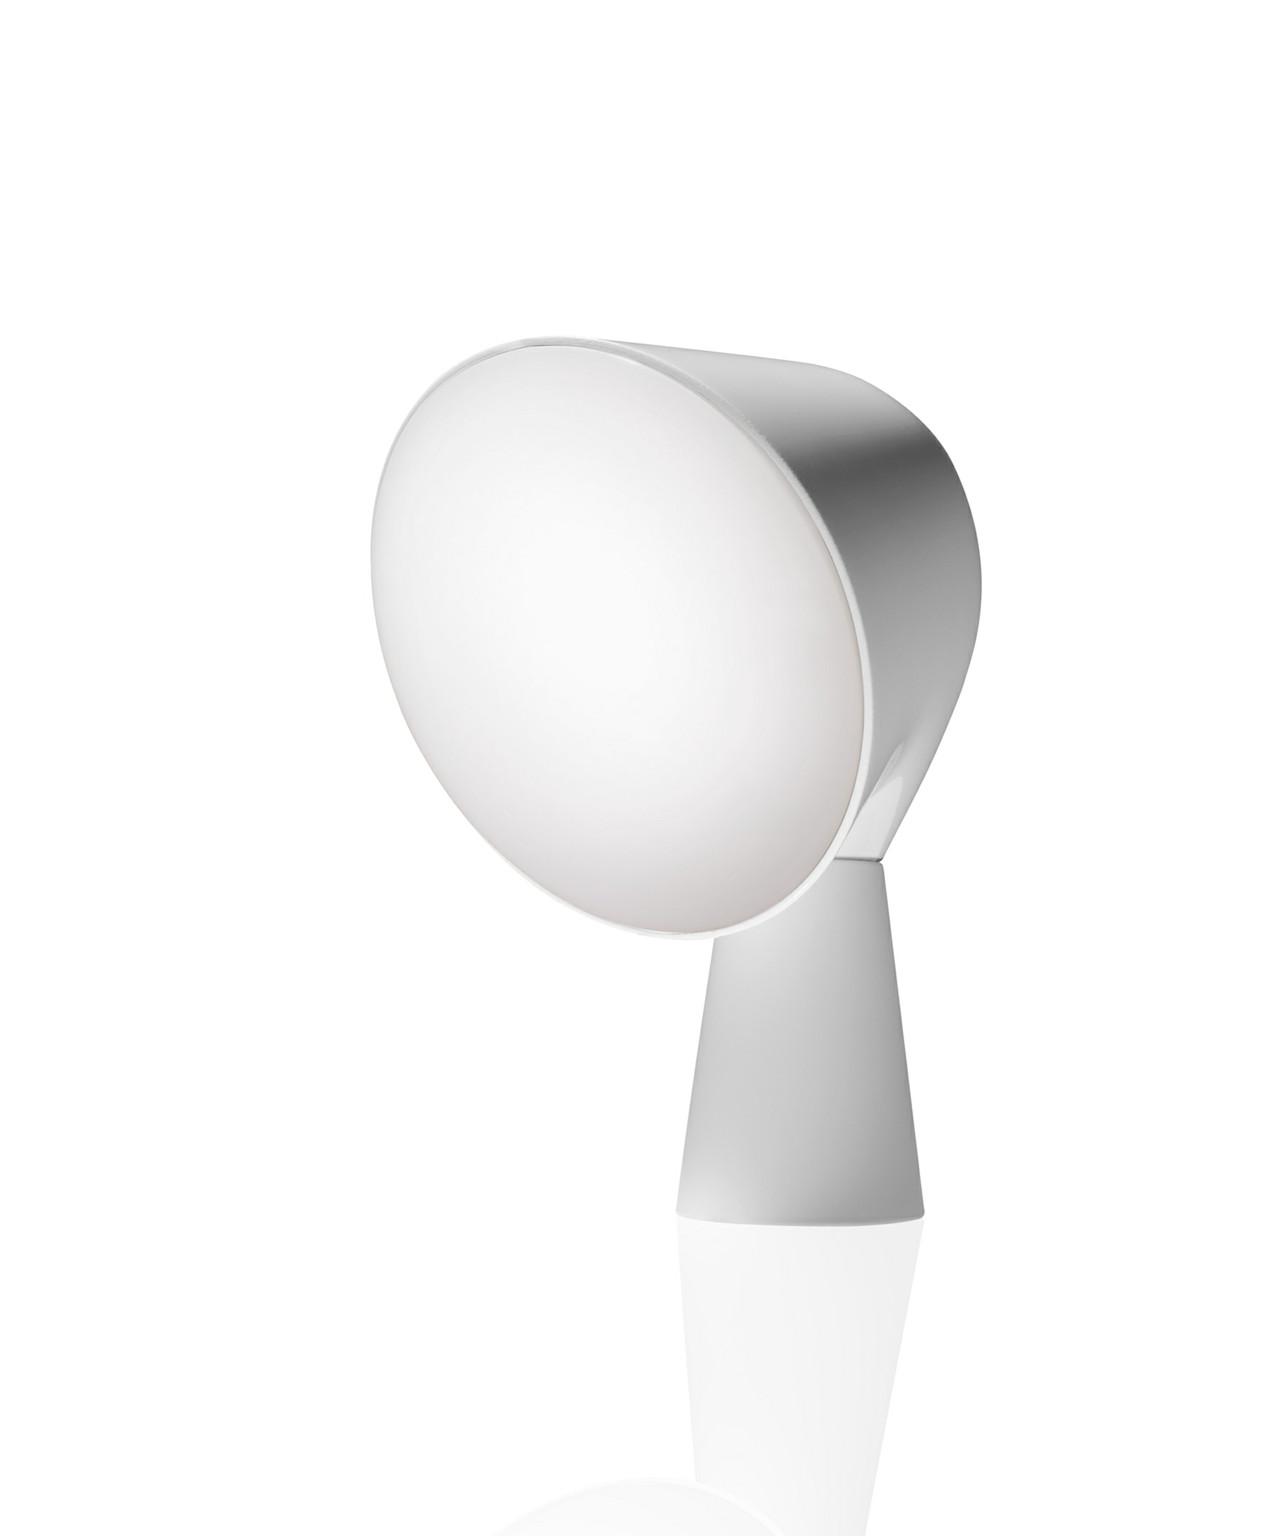 Image of   Binic Bordlampe Hvid - Foscarini